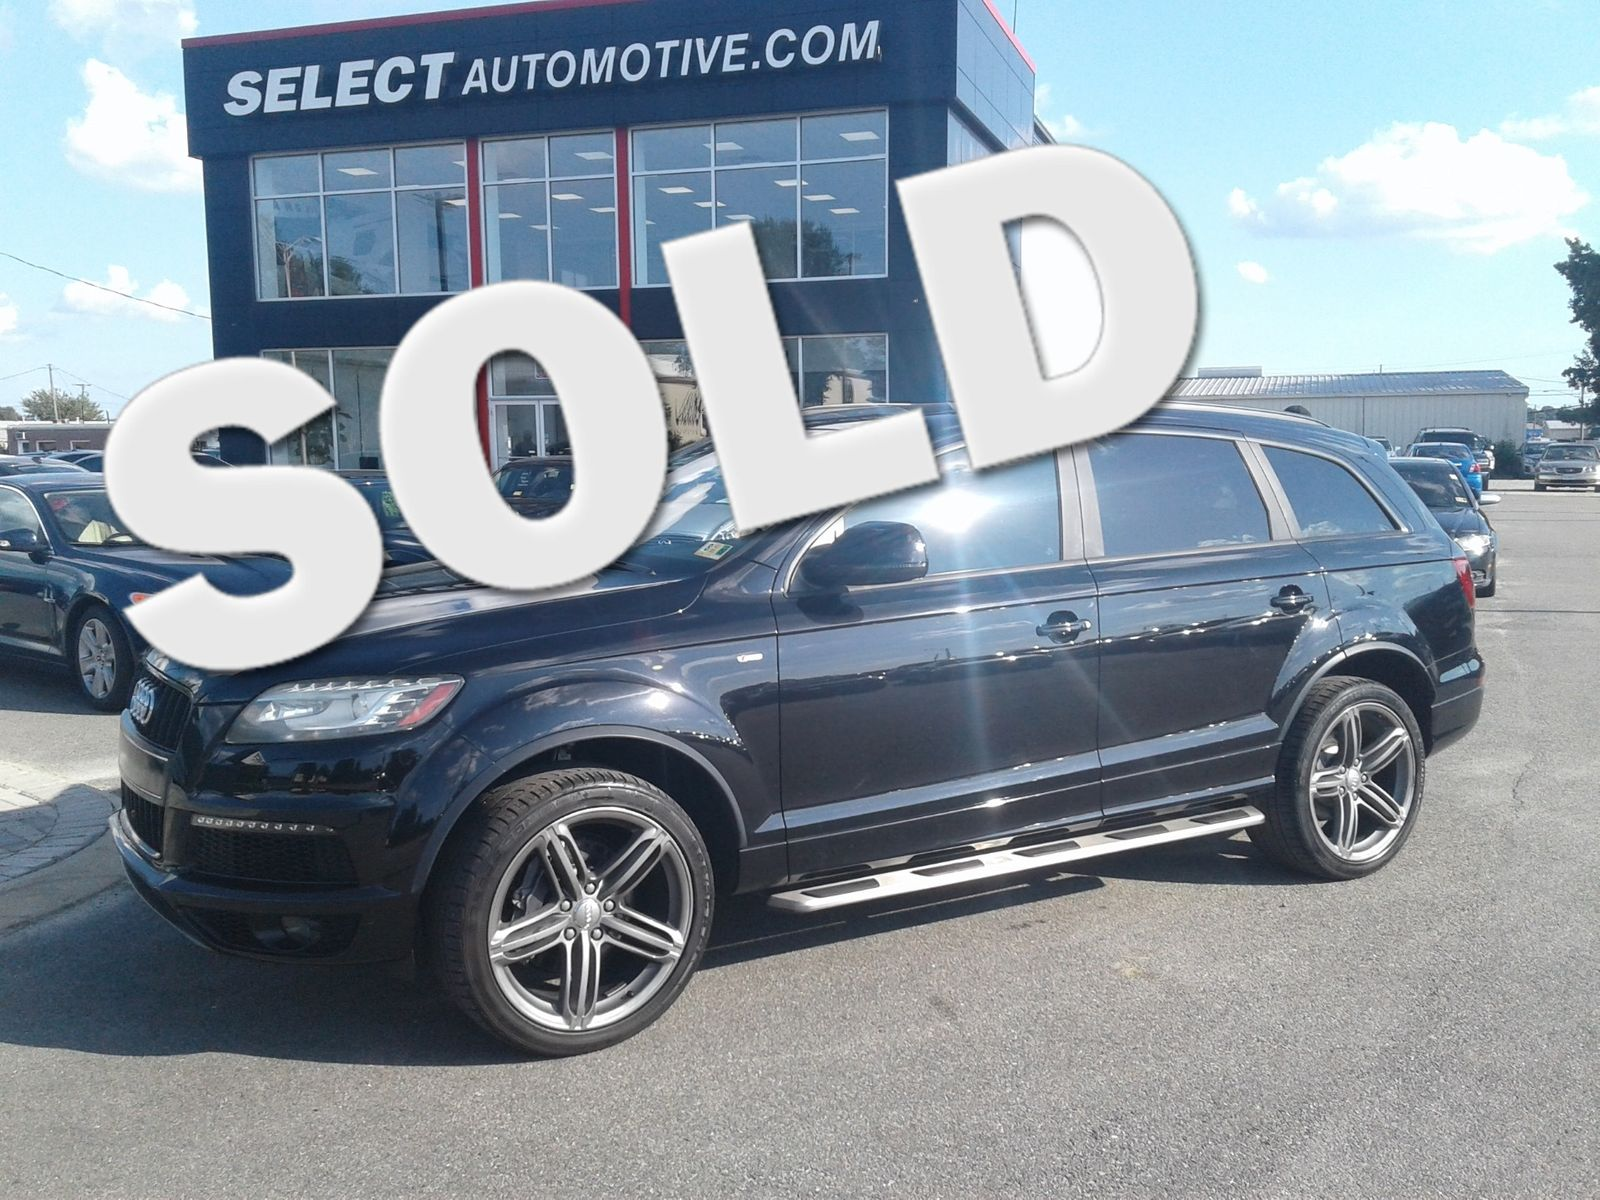 Audi Q L TDI Prestige City Virginia Select Automotive VA - Audi virginia beach